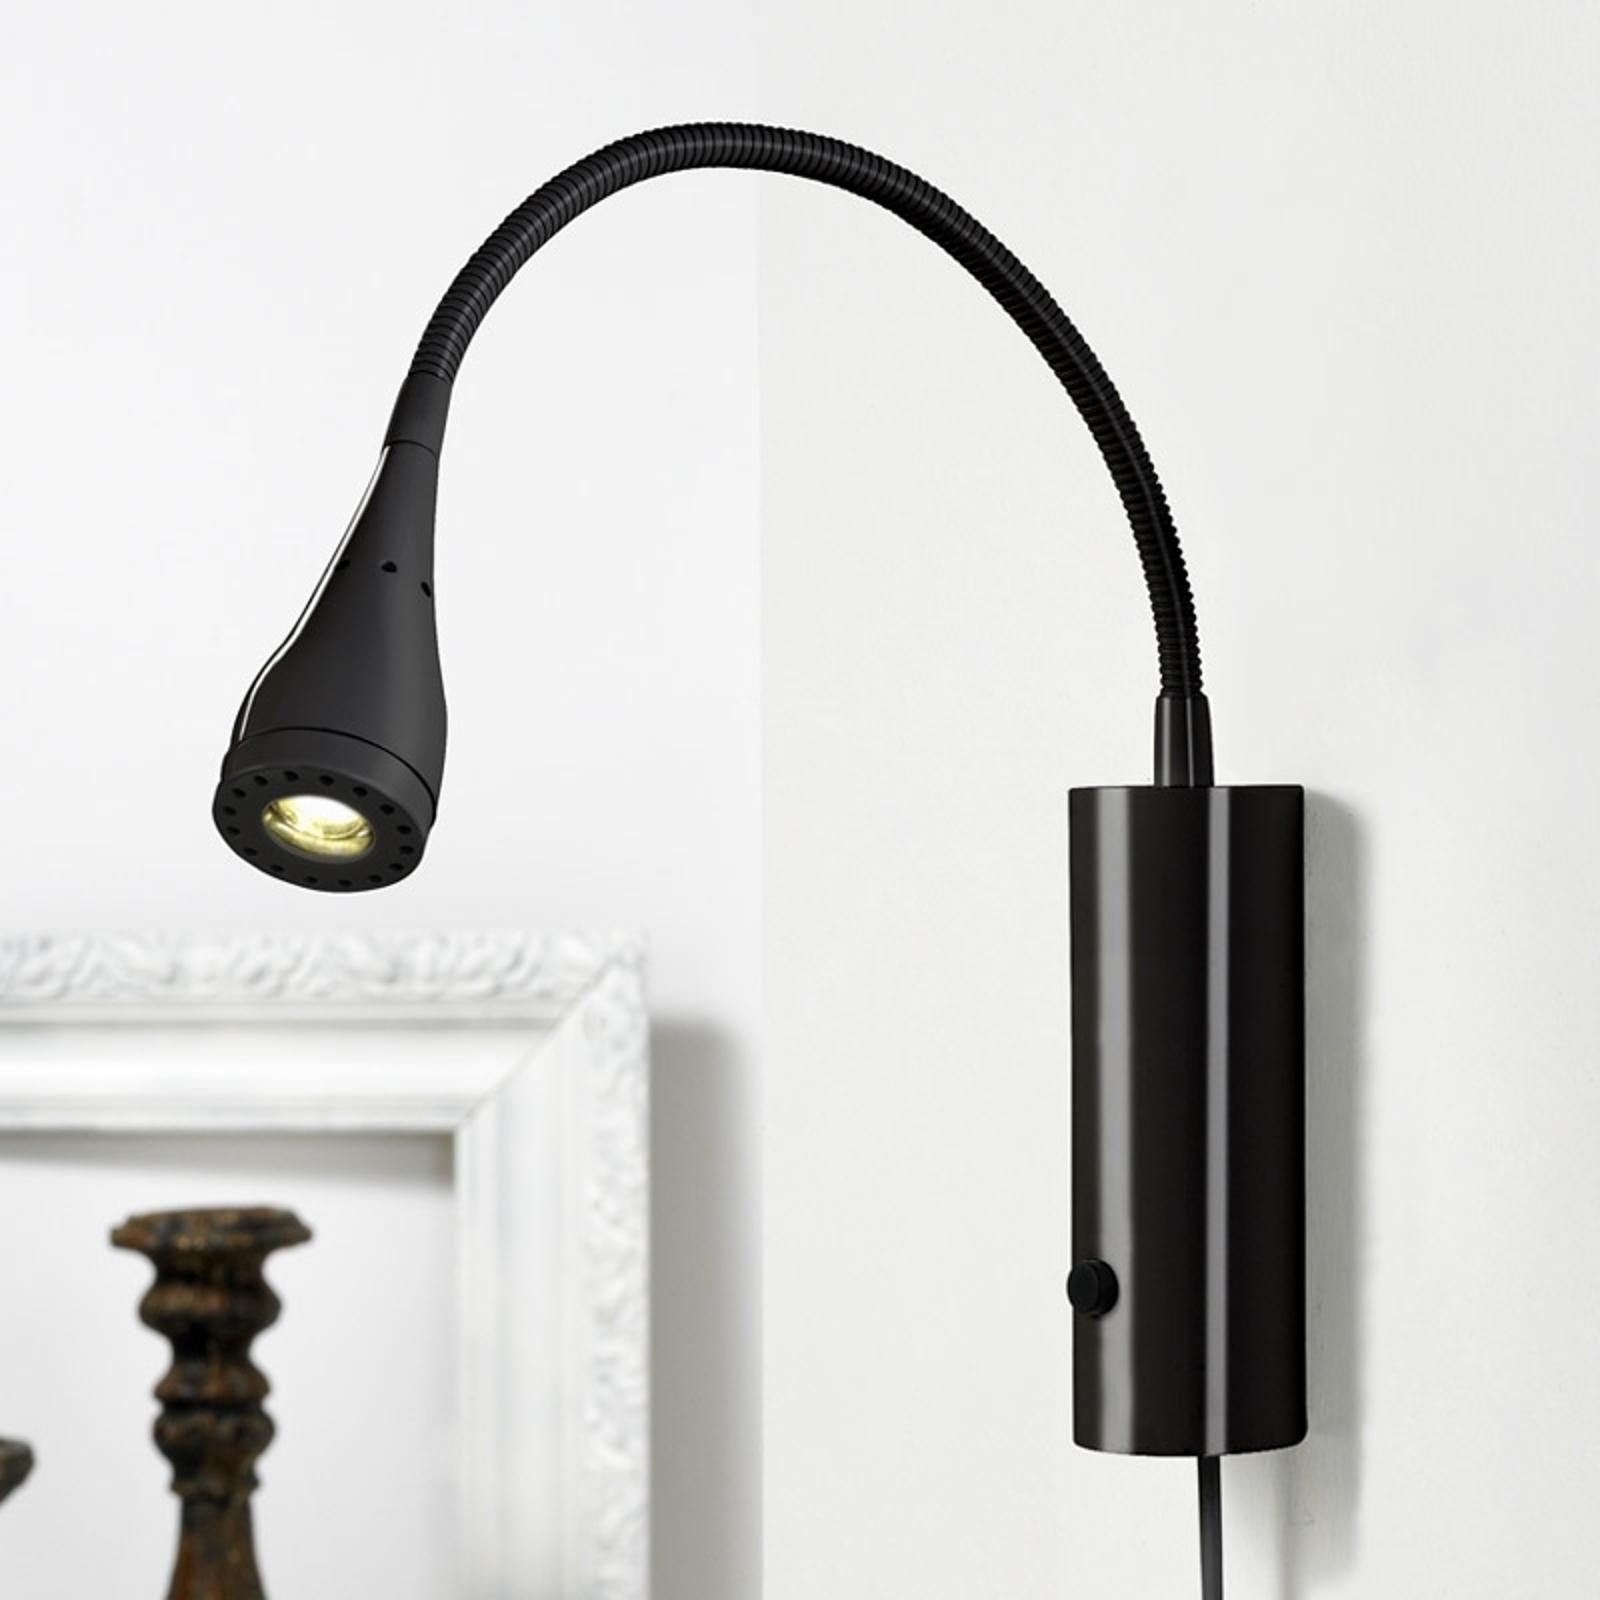 LED-Wandleuchte Mento mit Flexarm, schwarz